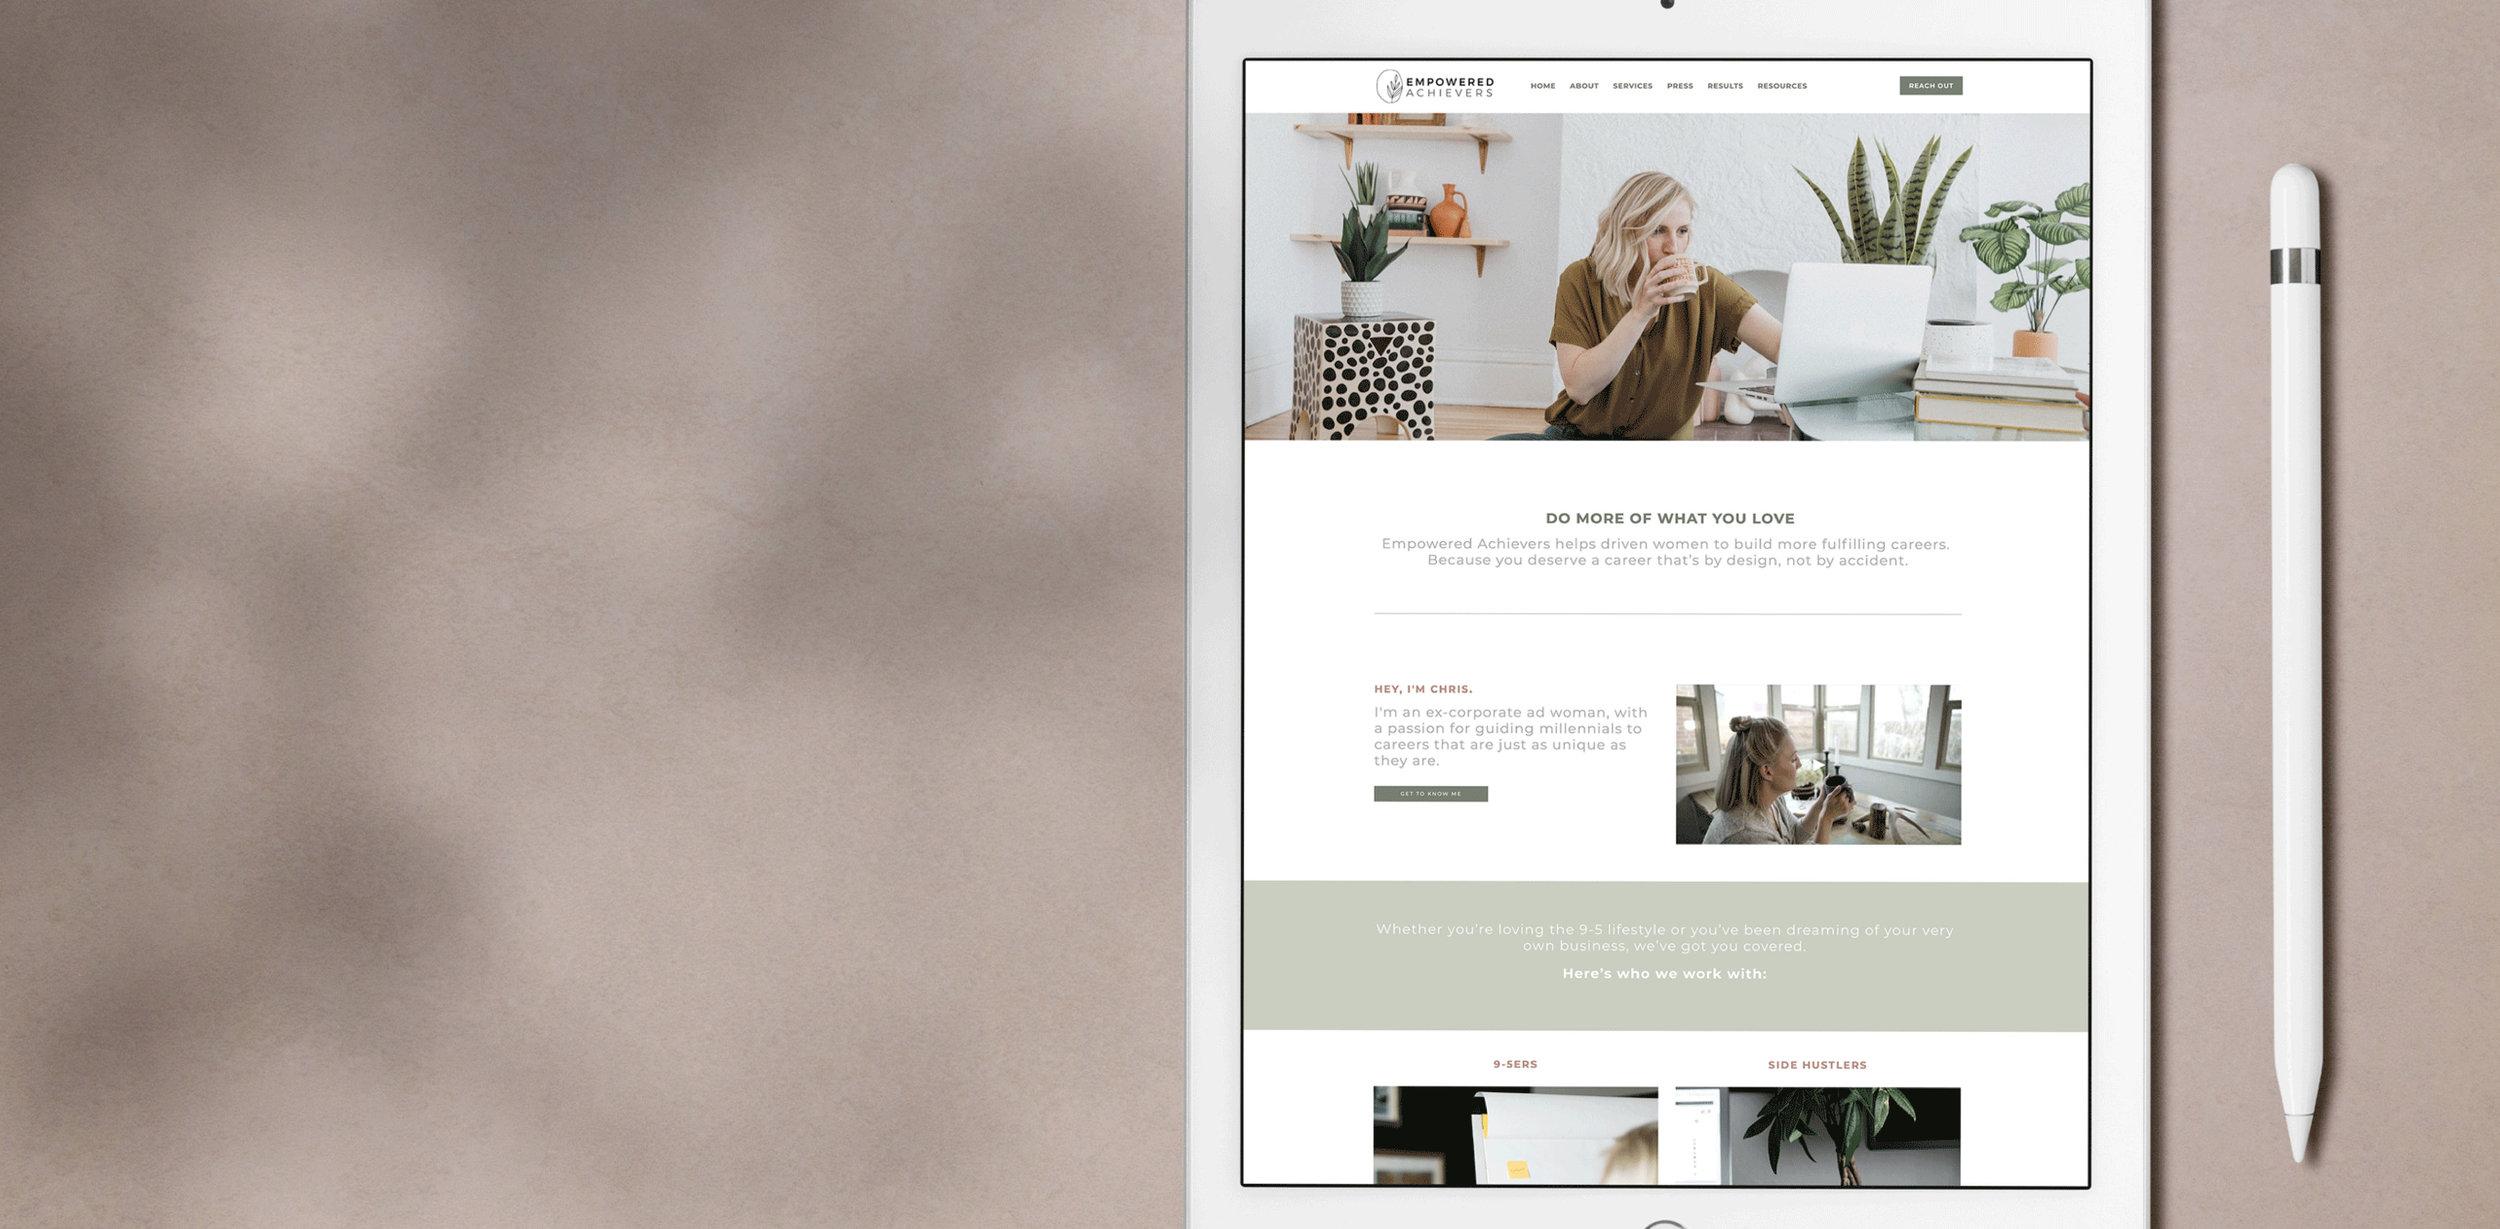 Squarespace website design for career coachies - Squarespace website design for millennials.jpg